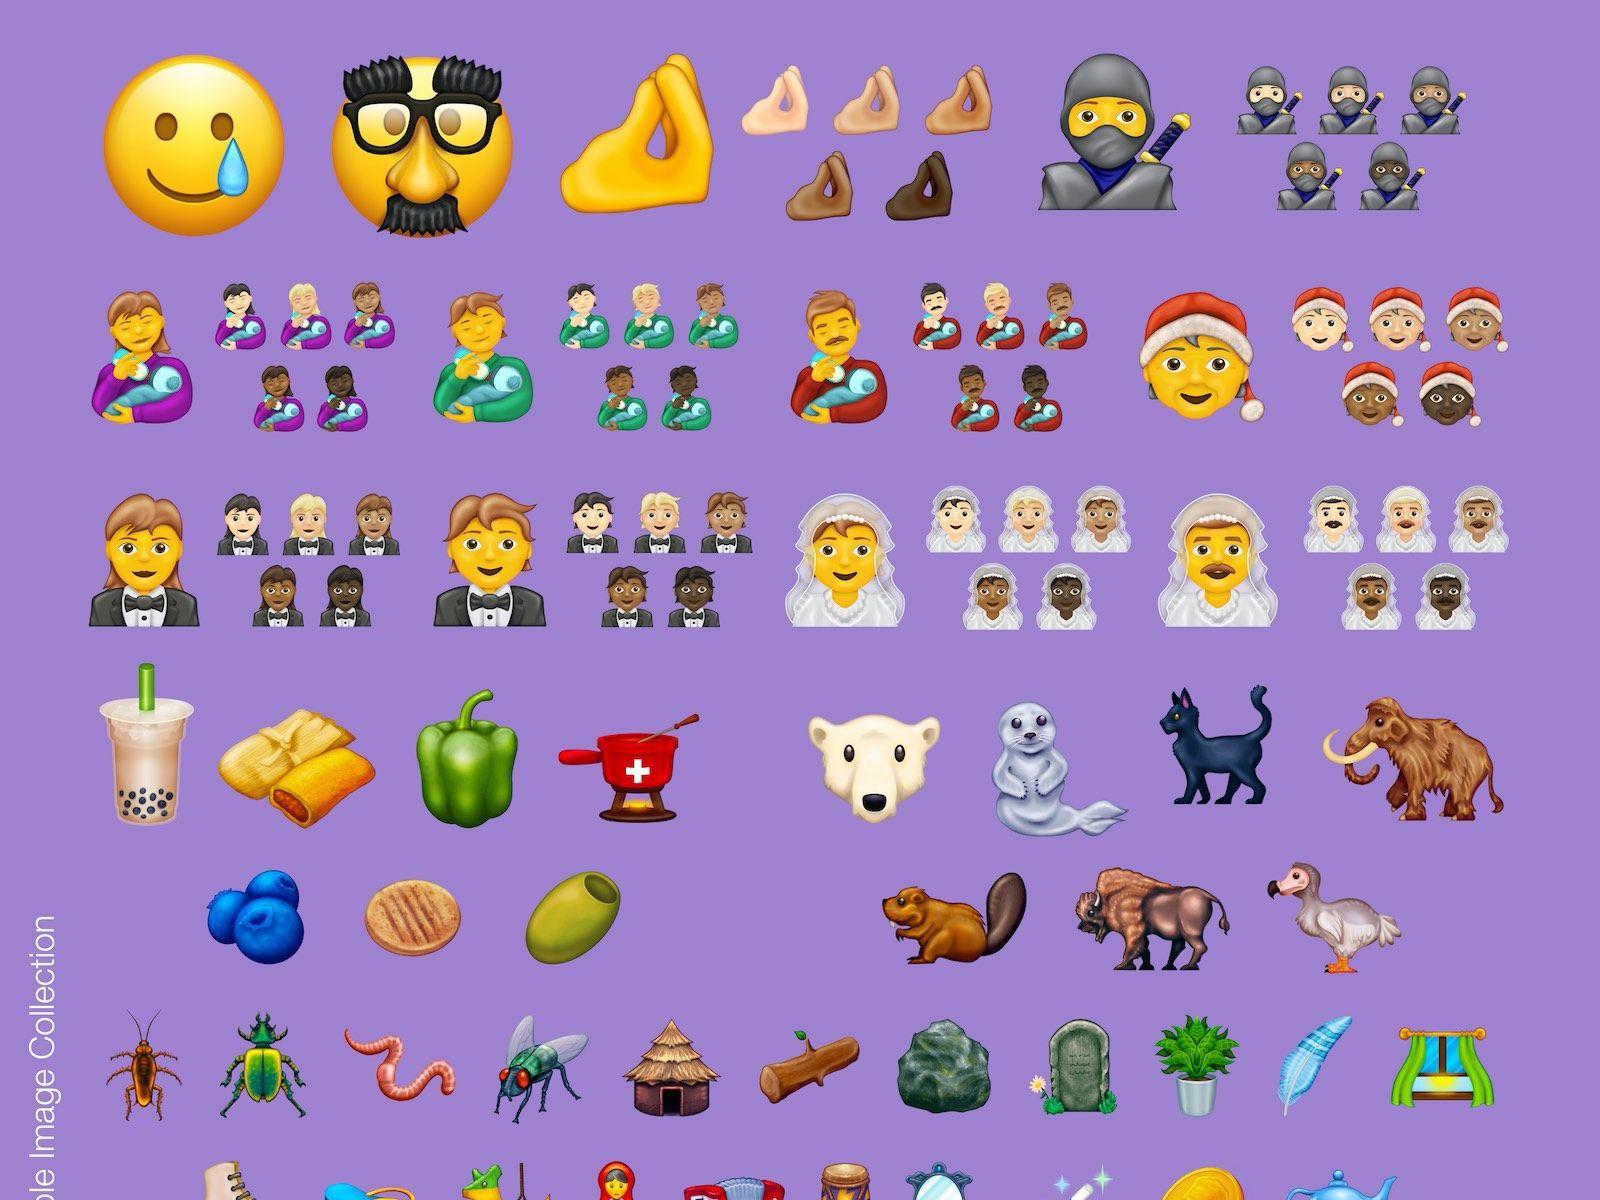 Pc emojis tinder View all